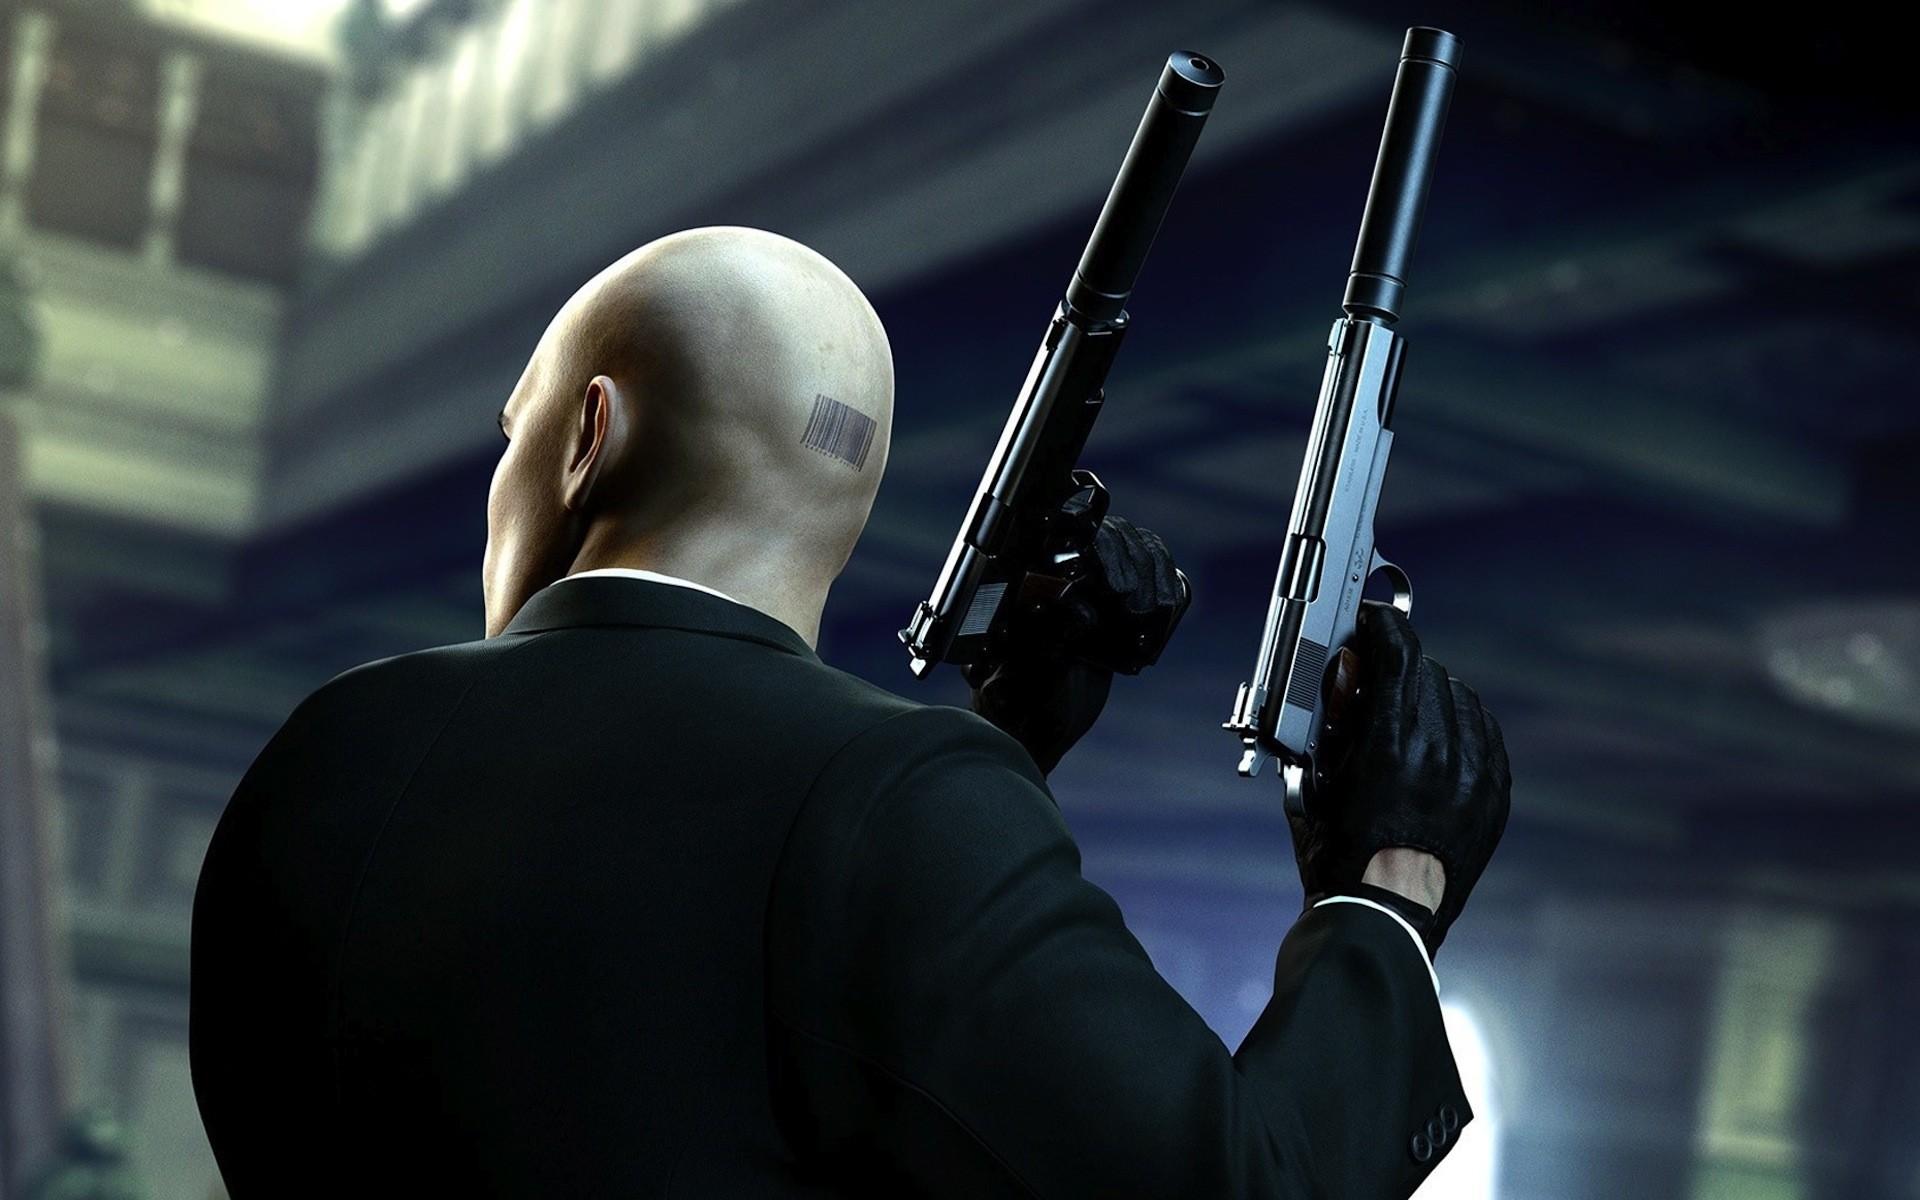 Video games guns hitman hitman absolution agent 47 wallpaper 1920x1200 10436 wallpaperup - Hitman 47 wallpaper ...